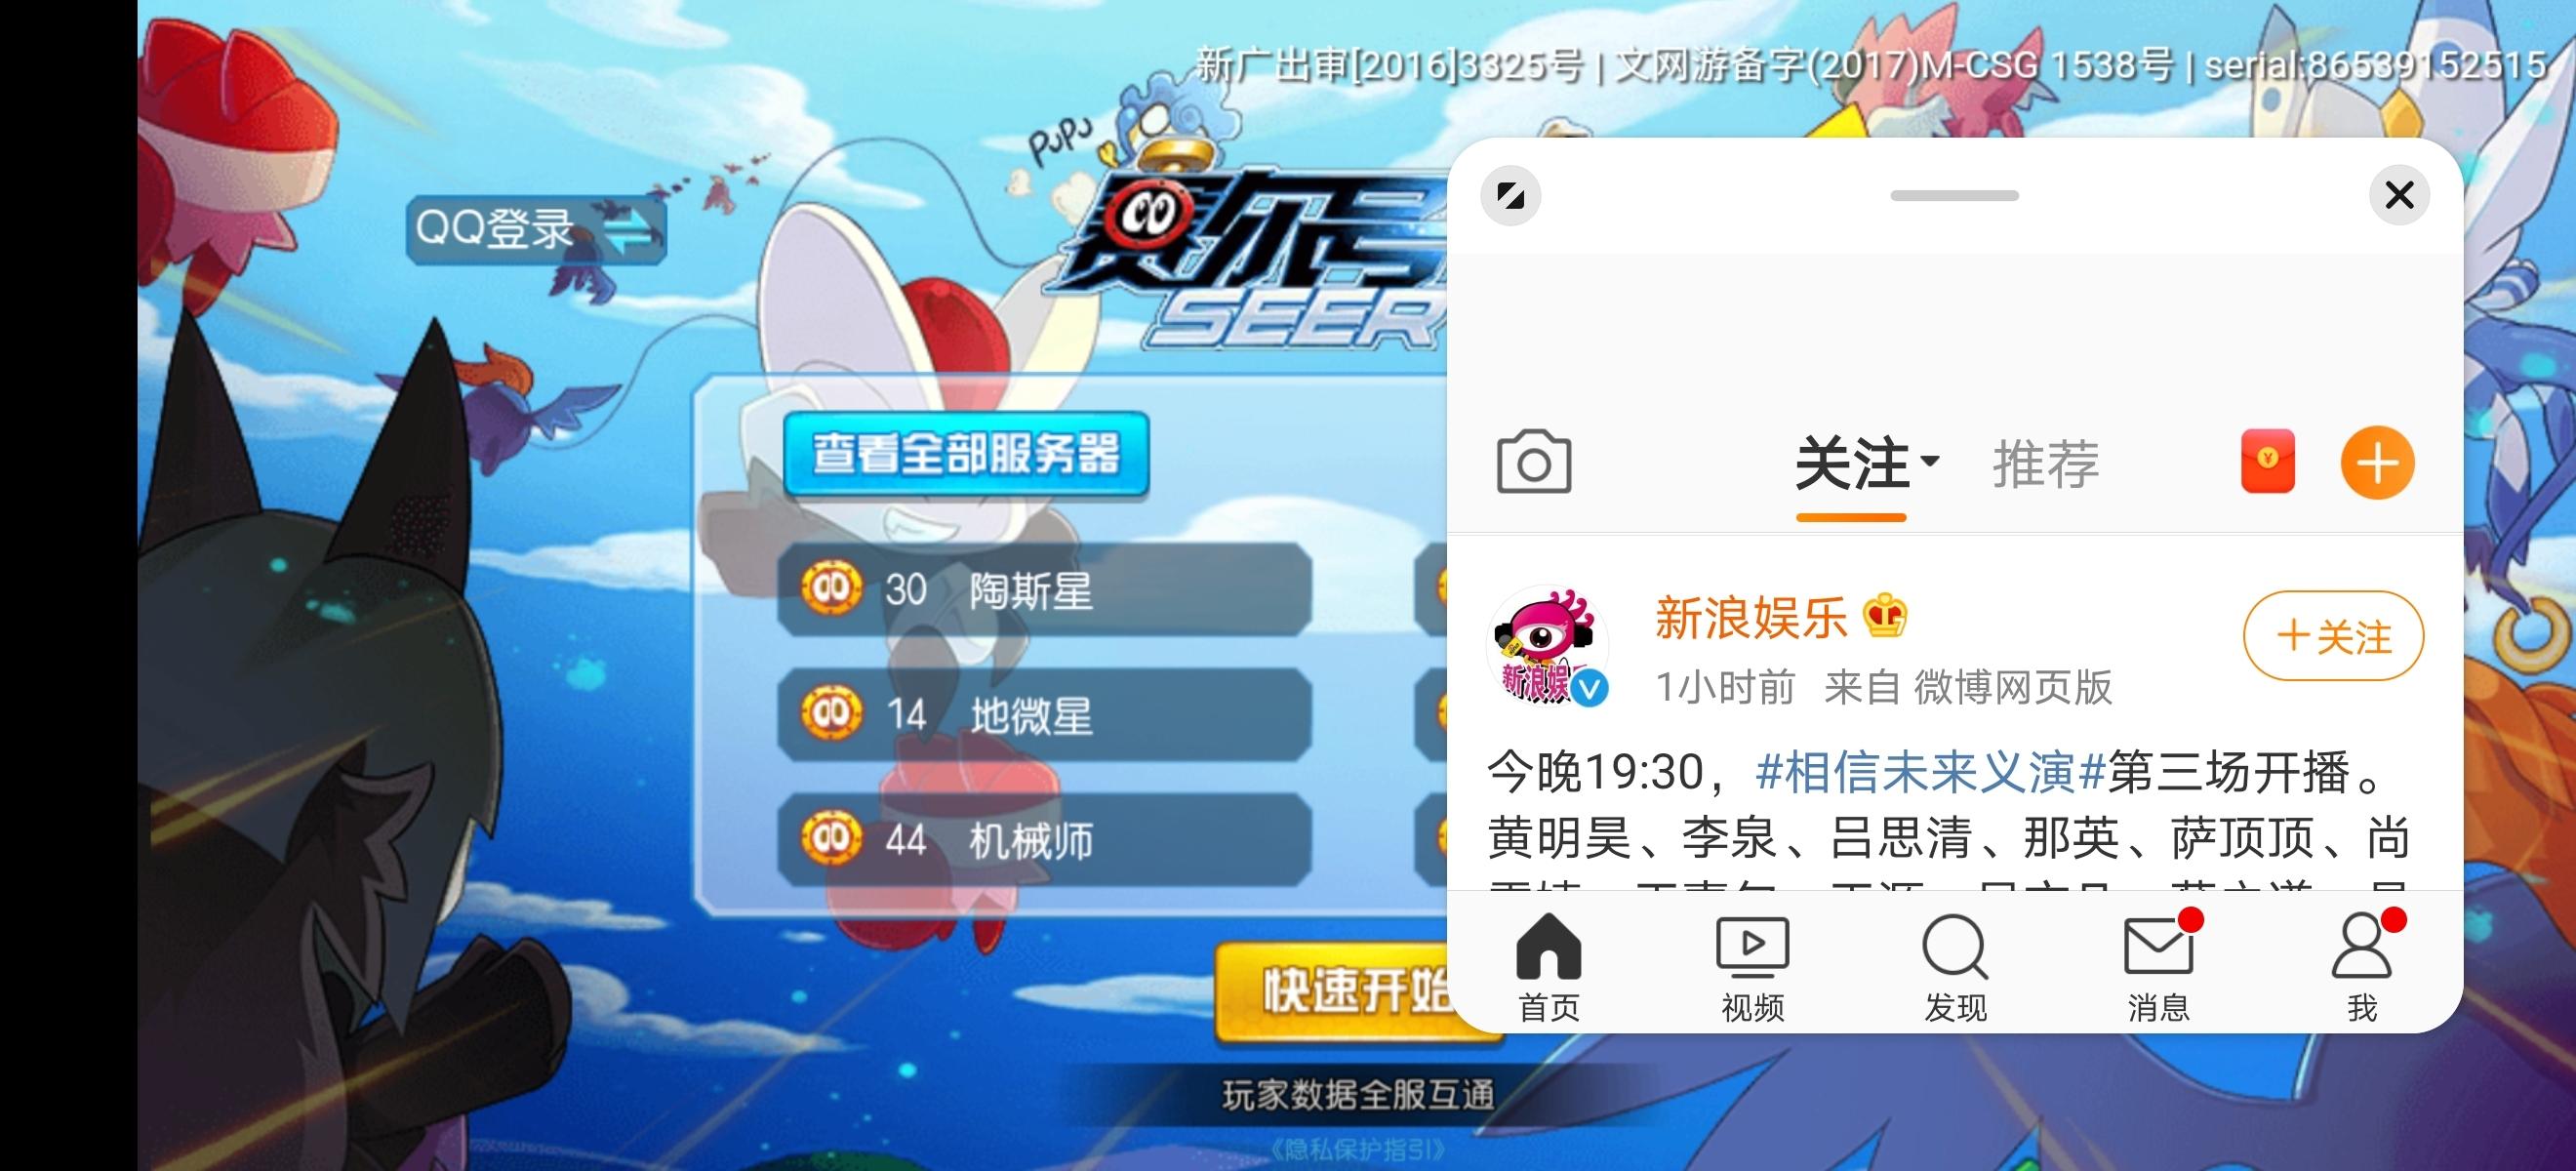 Screenshot_20200509_202122_com.sina.weibo.jpg